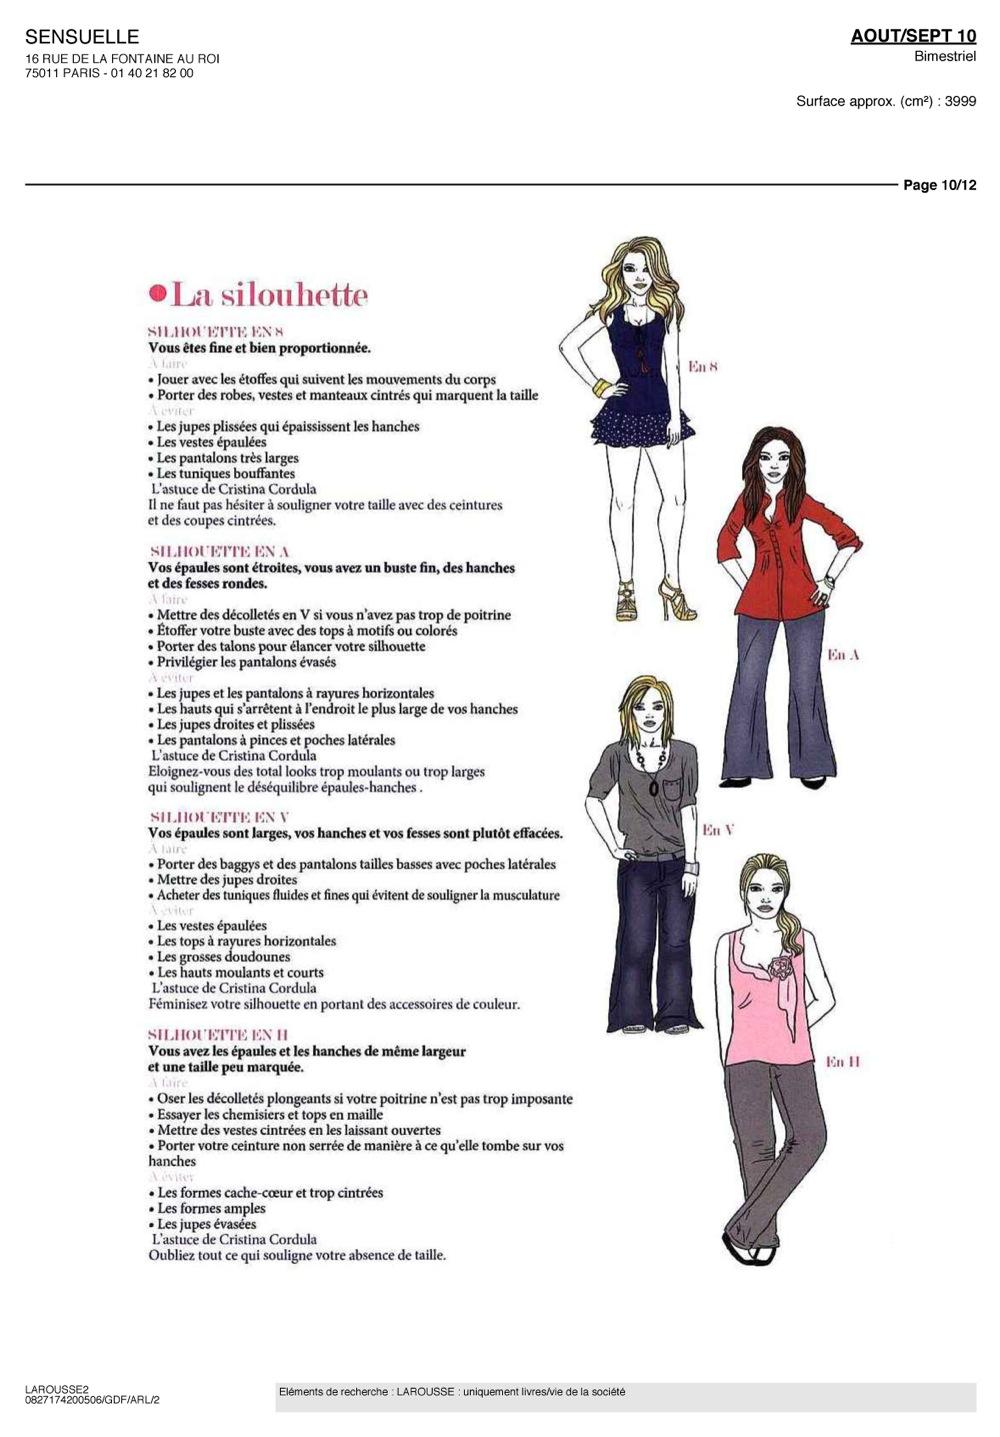 05-sensuelle-10_1000x1437-shkl_